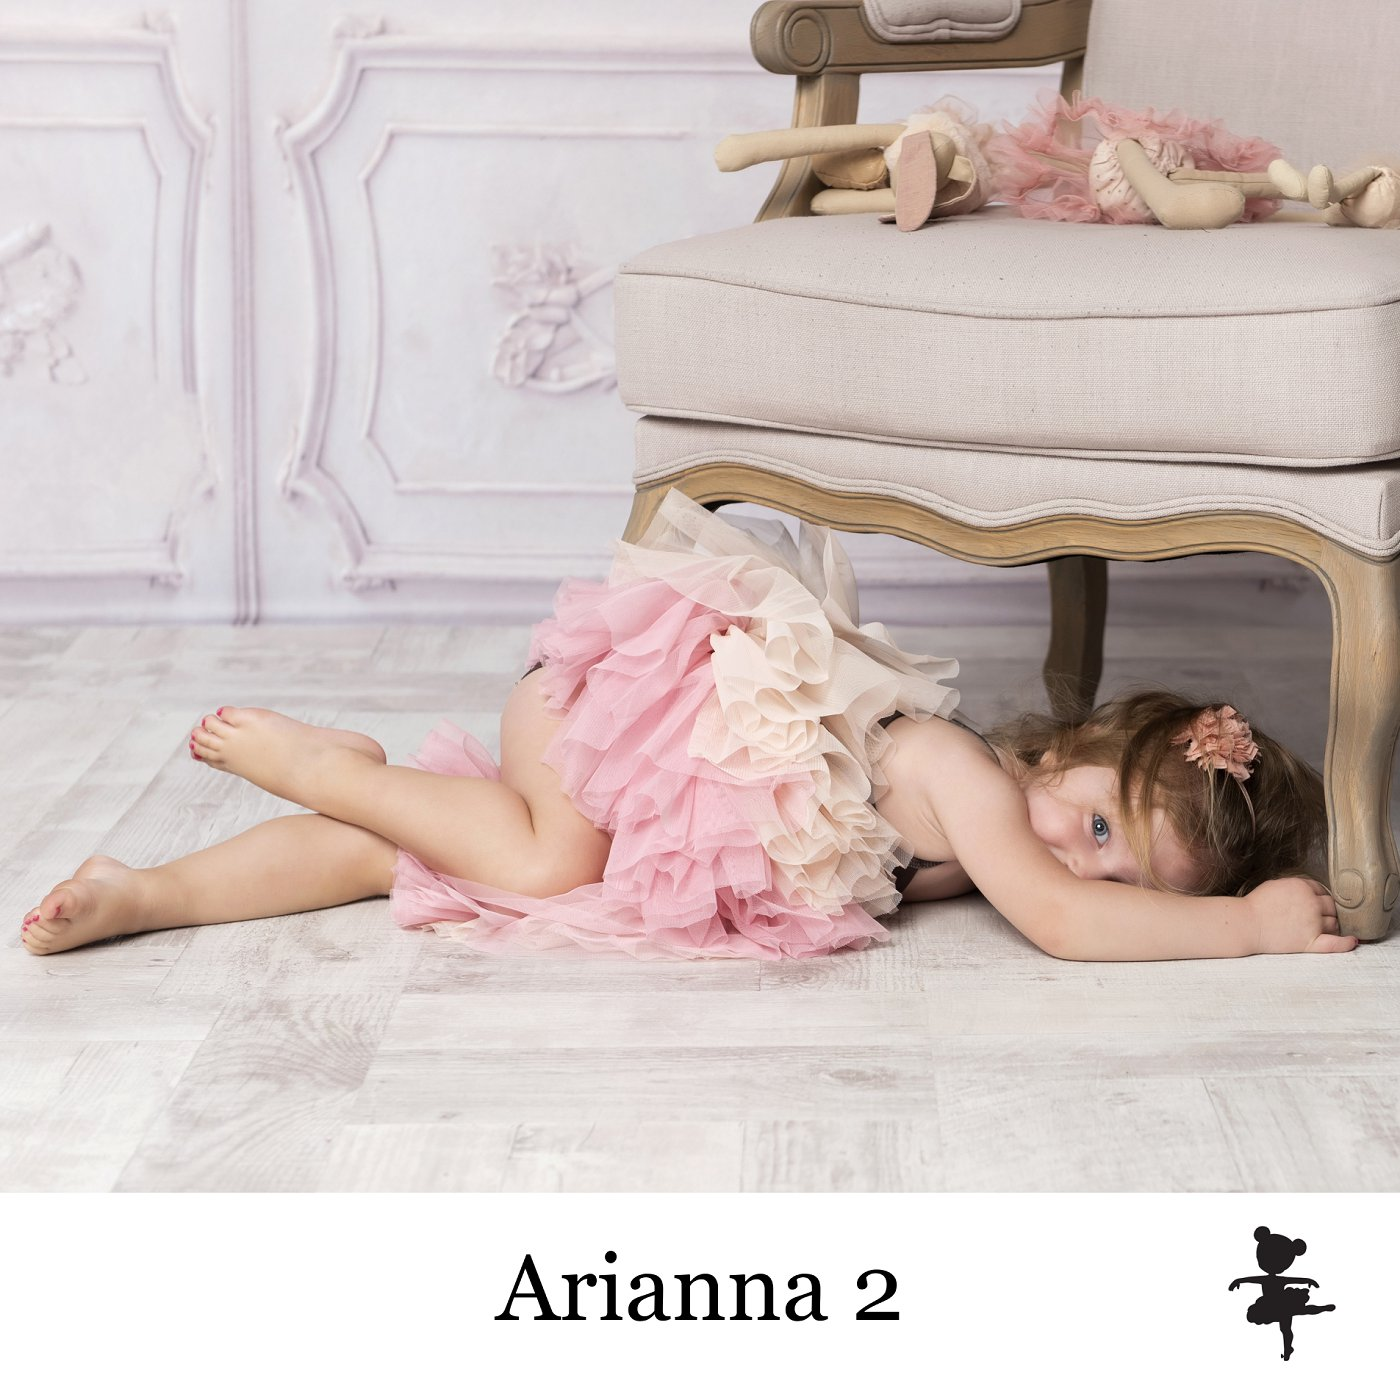 LB0619-Arianna2.jpg